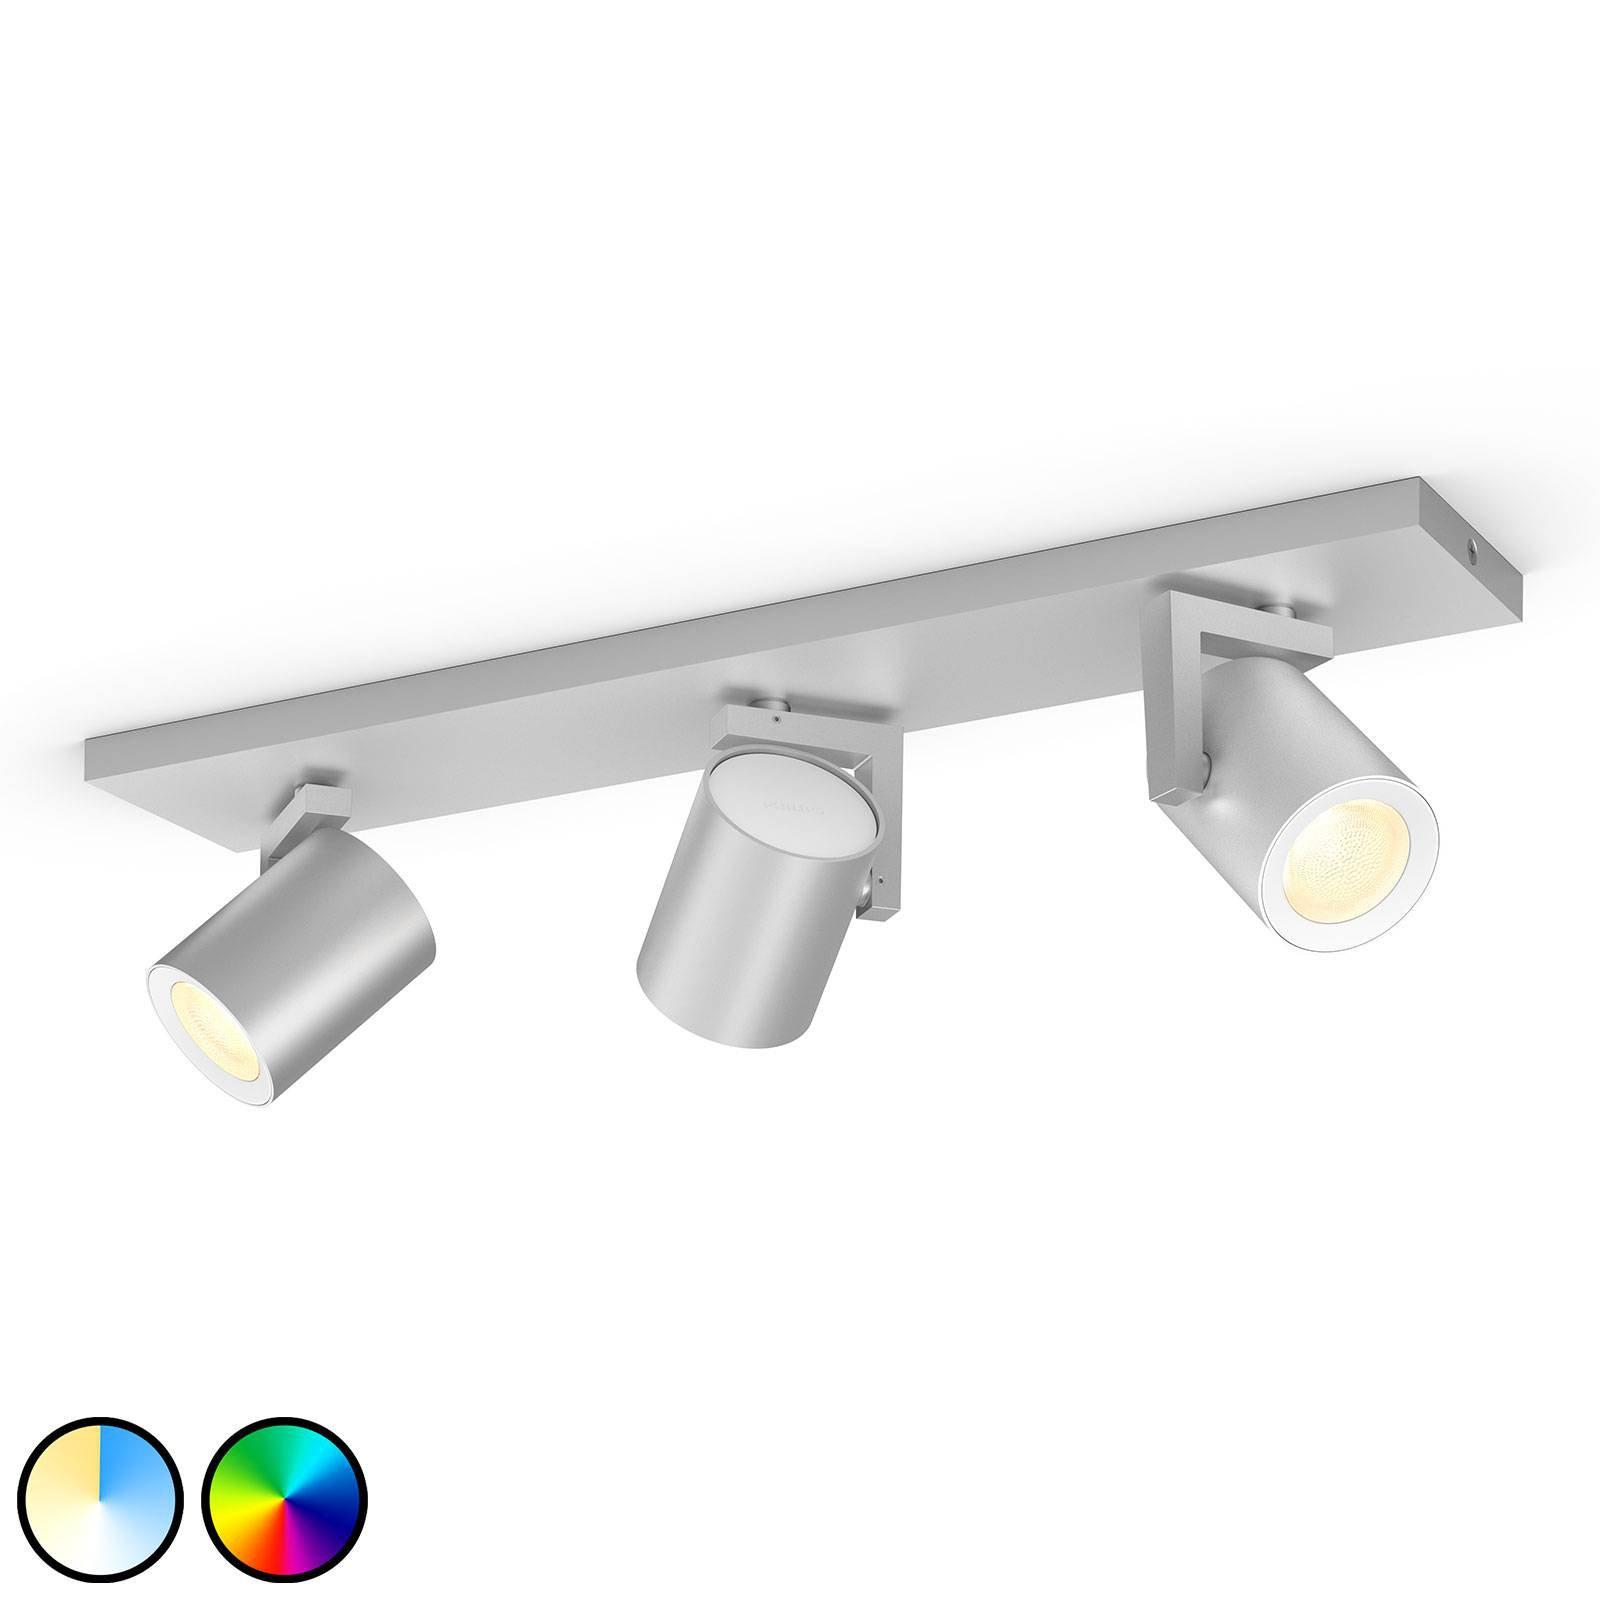 Philips Hue Argenta LED-spot tre lyskilder alu